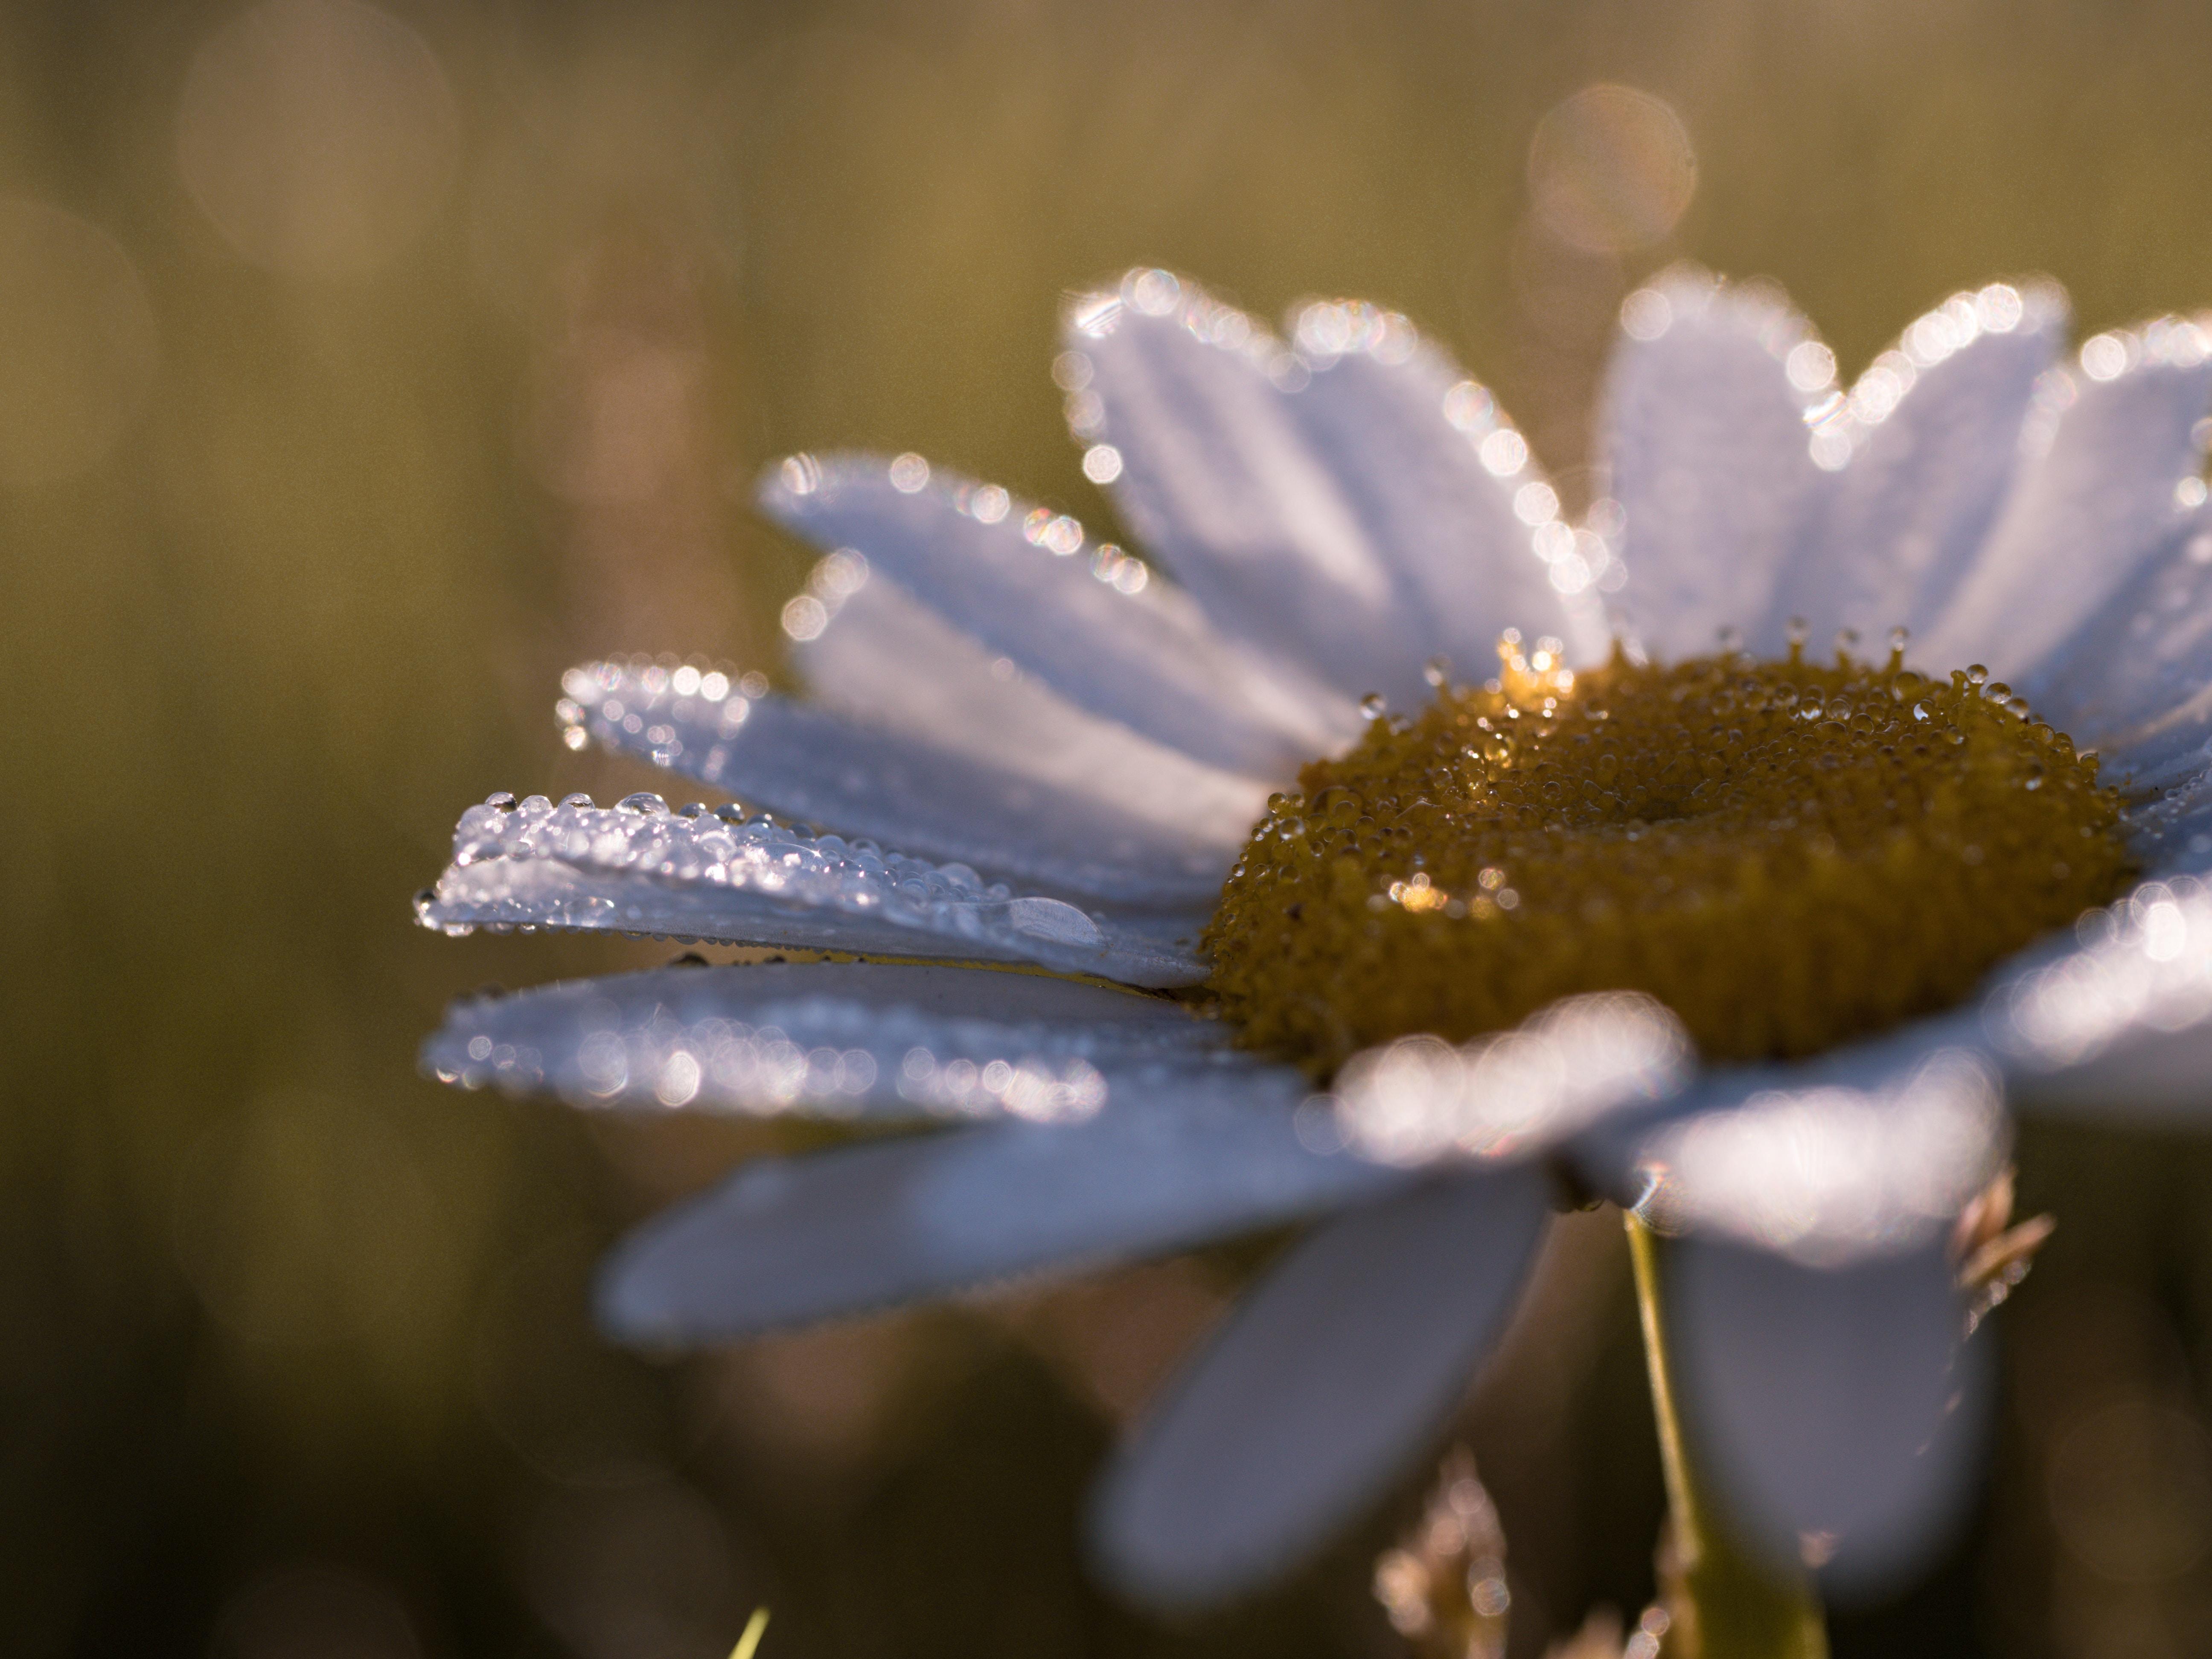 close-up photo of daisy flower